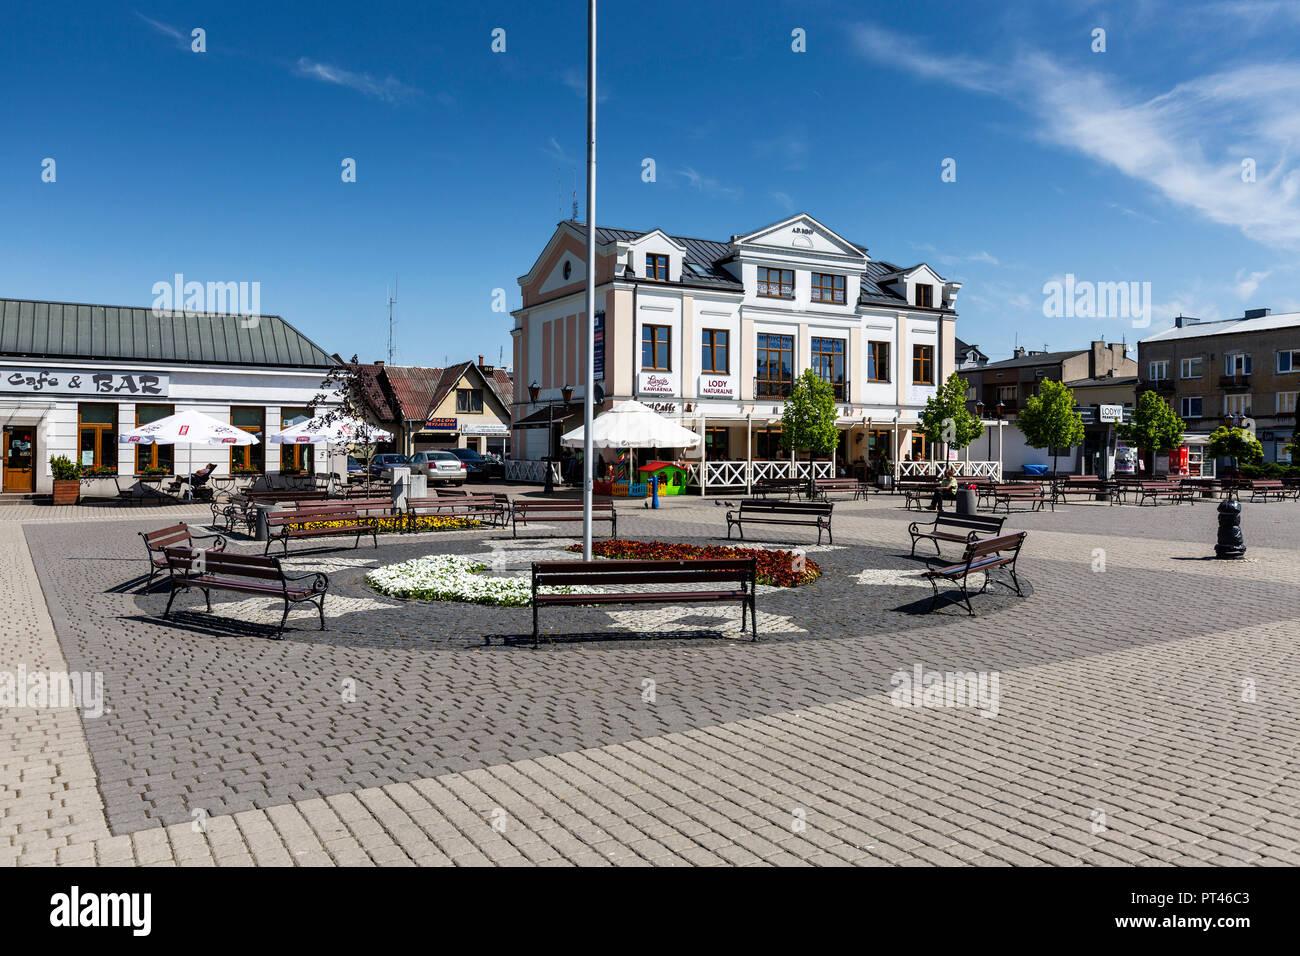 Europa, Poland, Voivodeship Masovian, Sochaczew - Stock Image